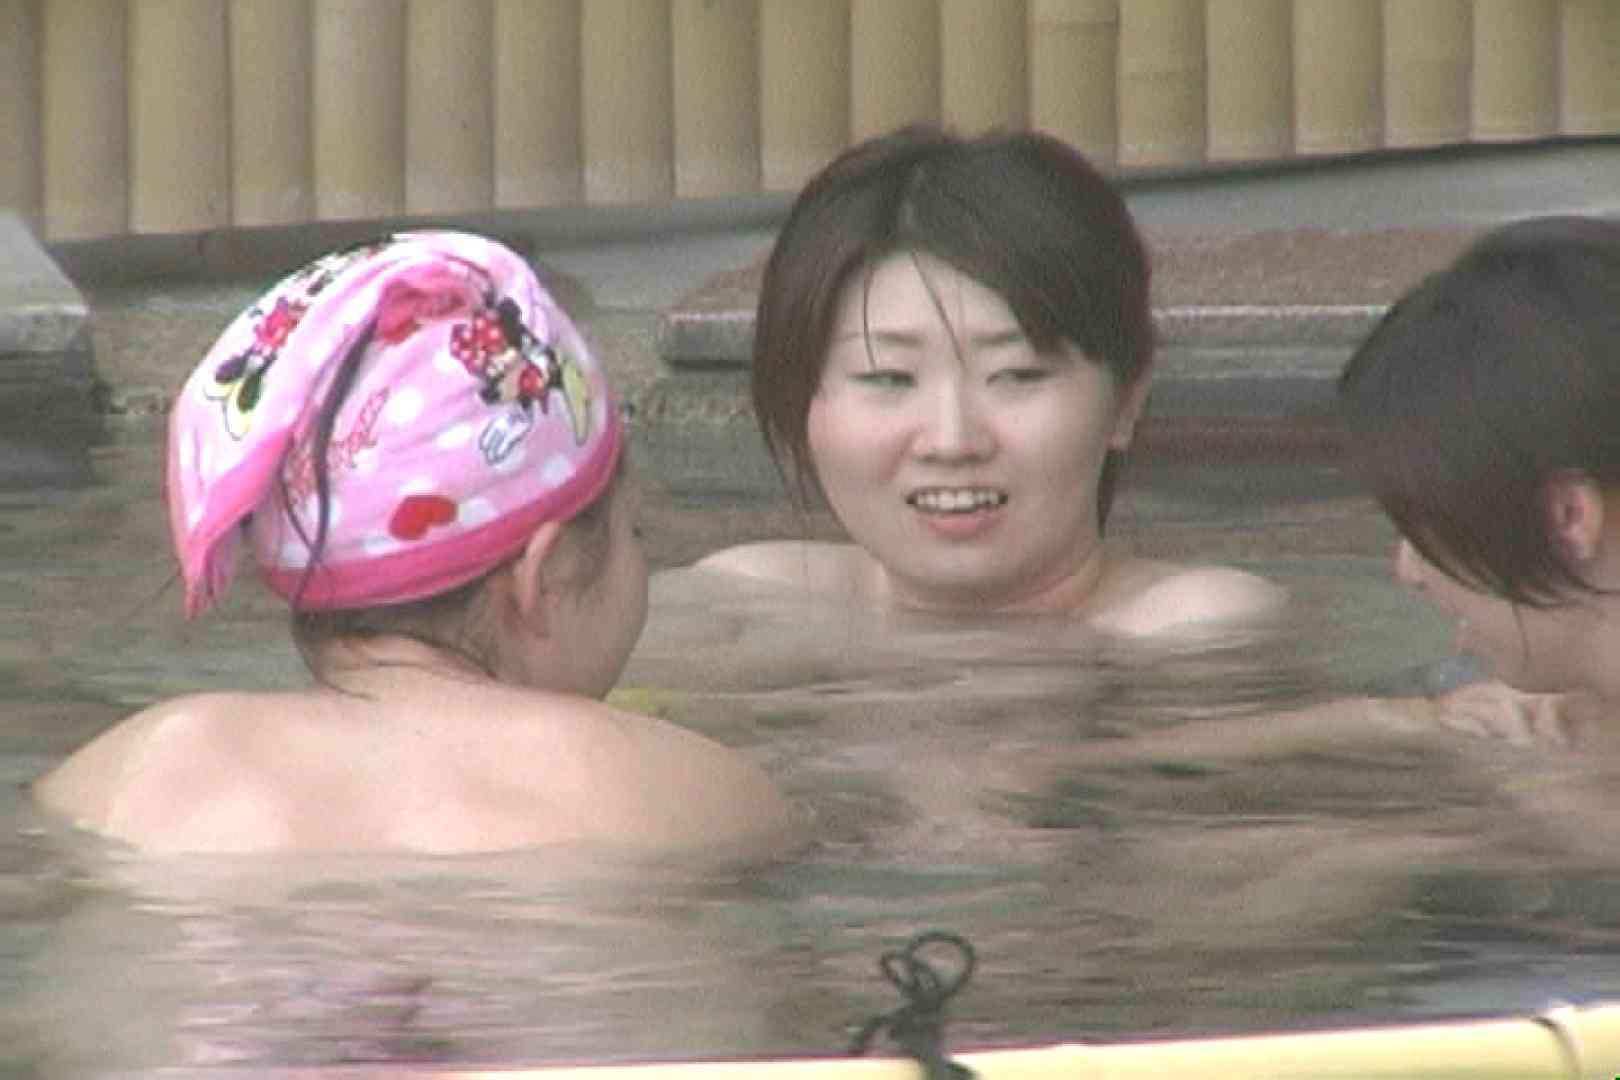 Aquaな露天風呂Vol.25 露天風呂編  91PIX 74